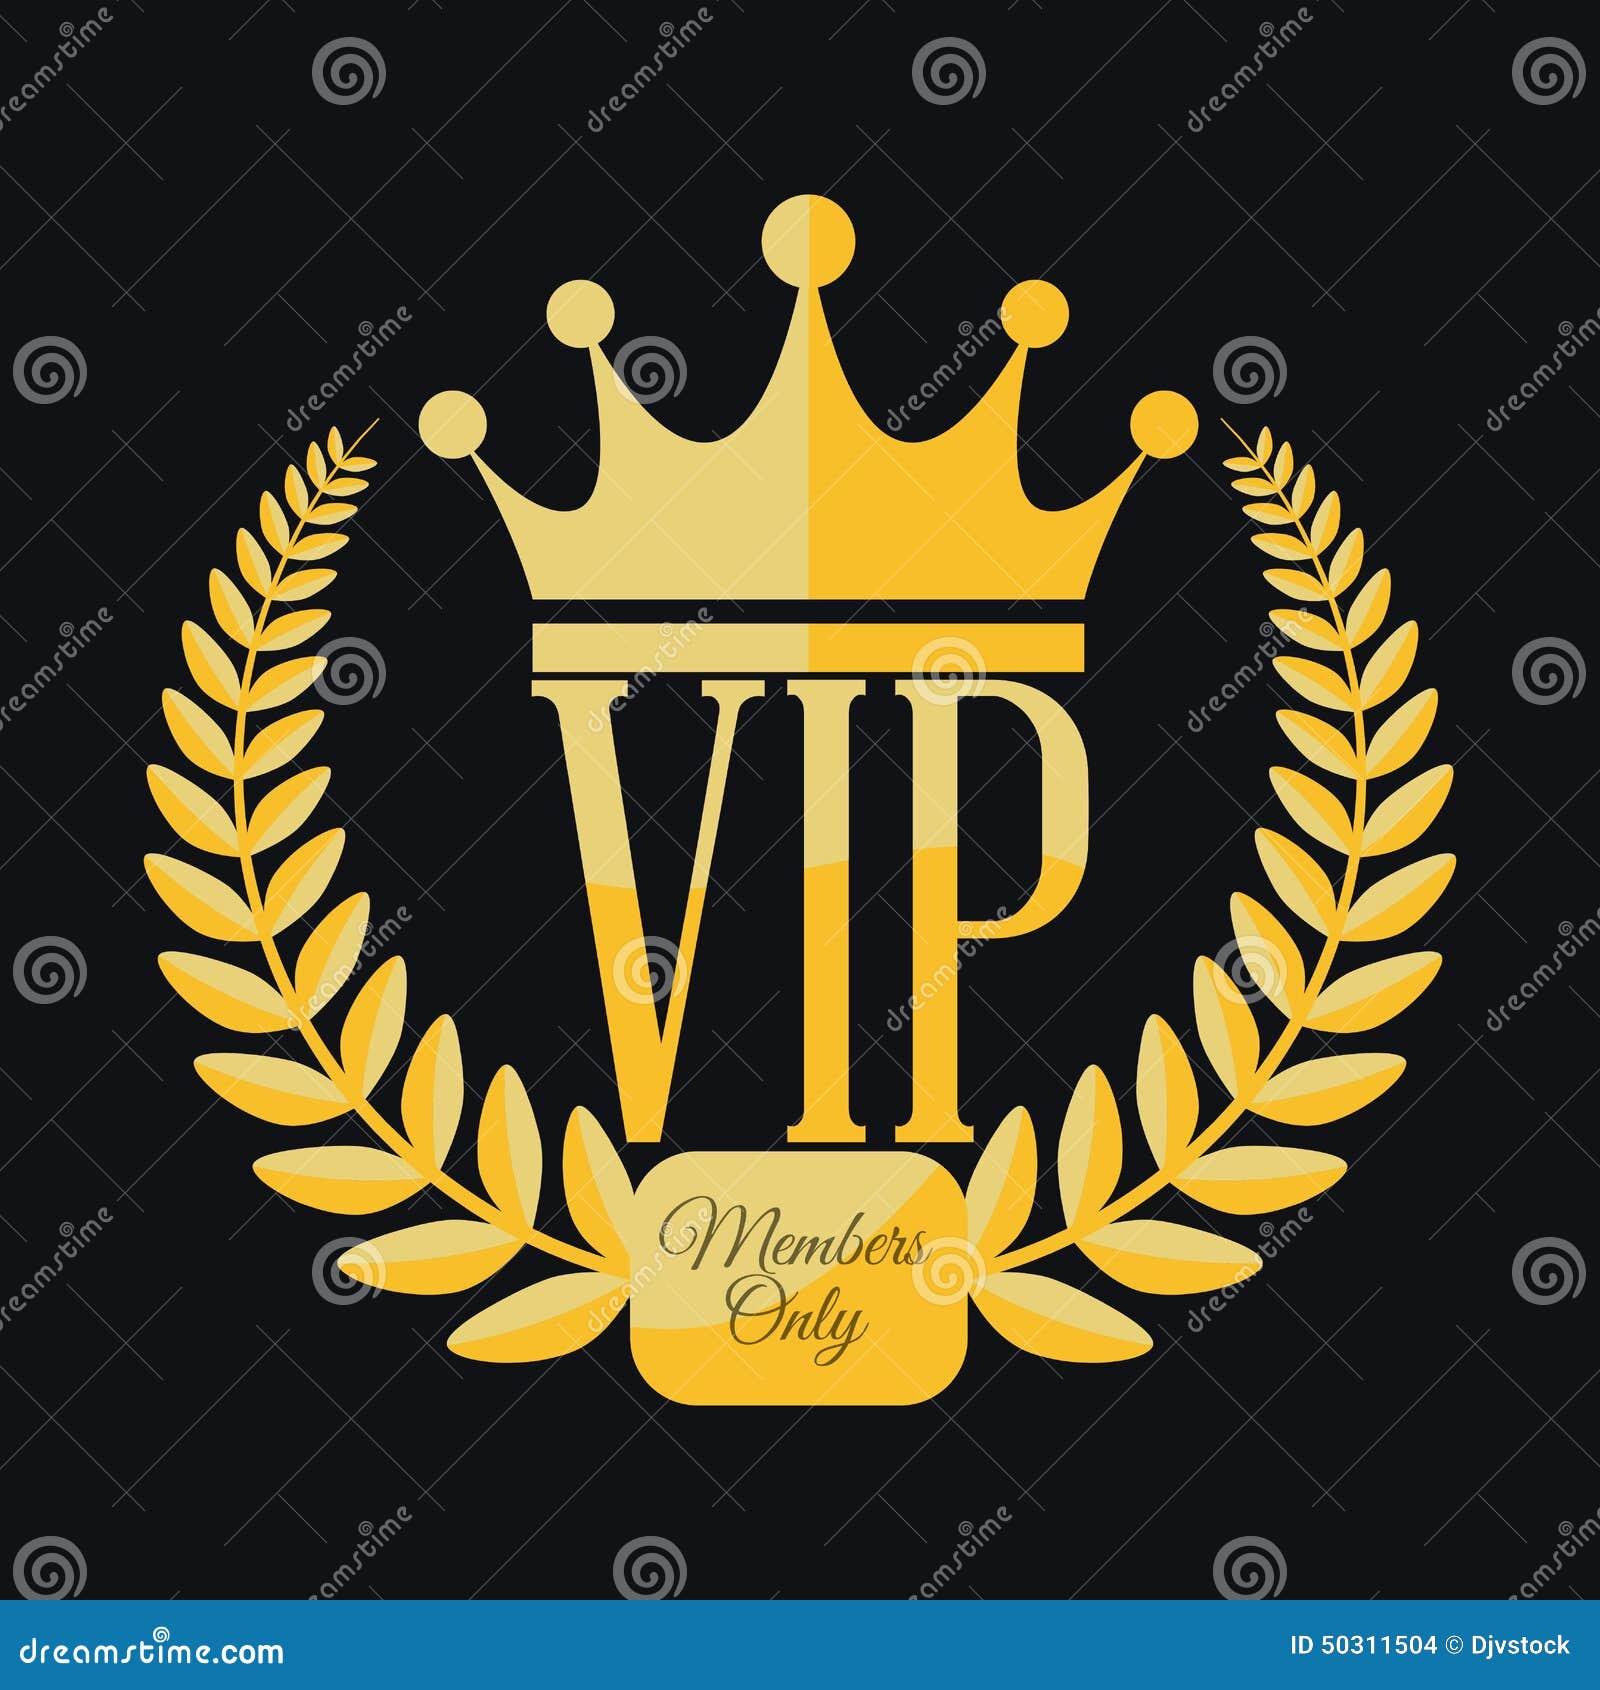 Vip Card Design Vector Free Download